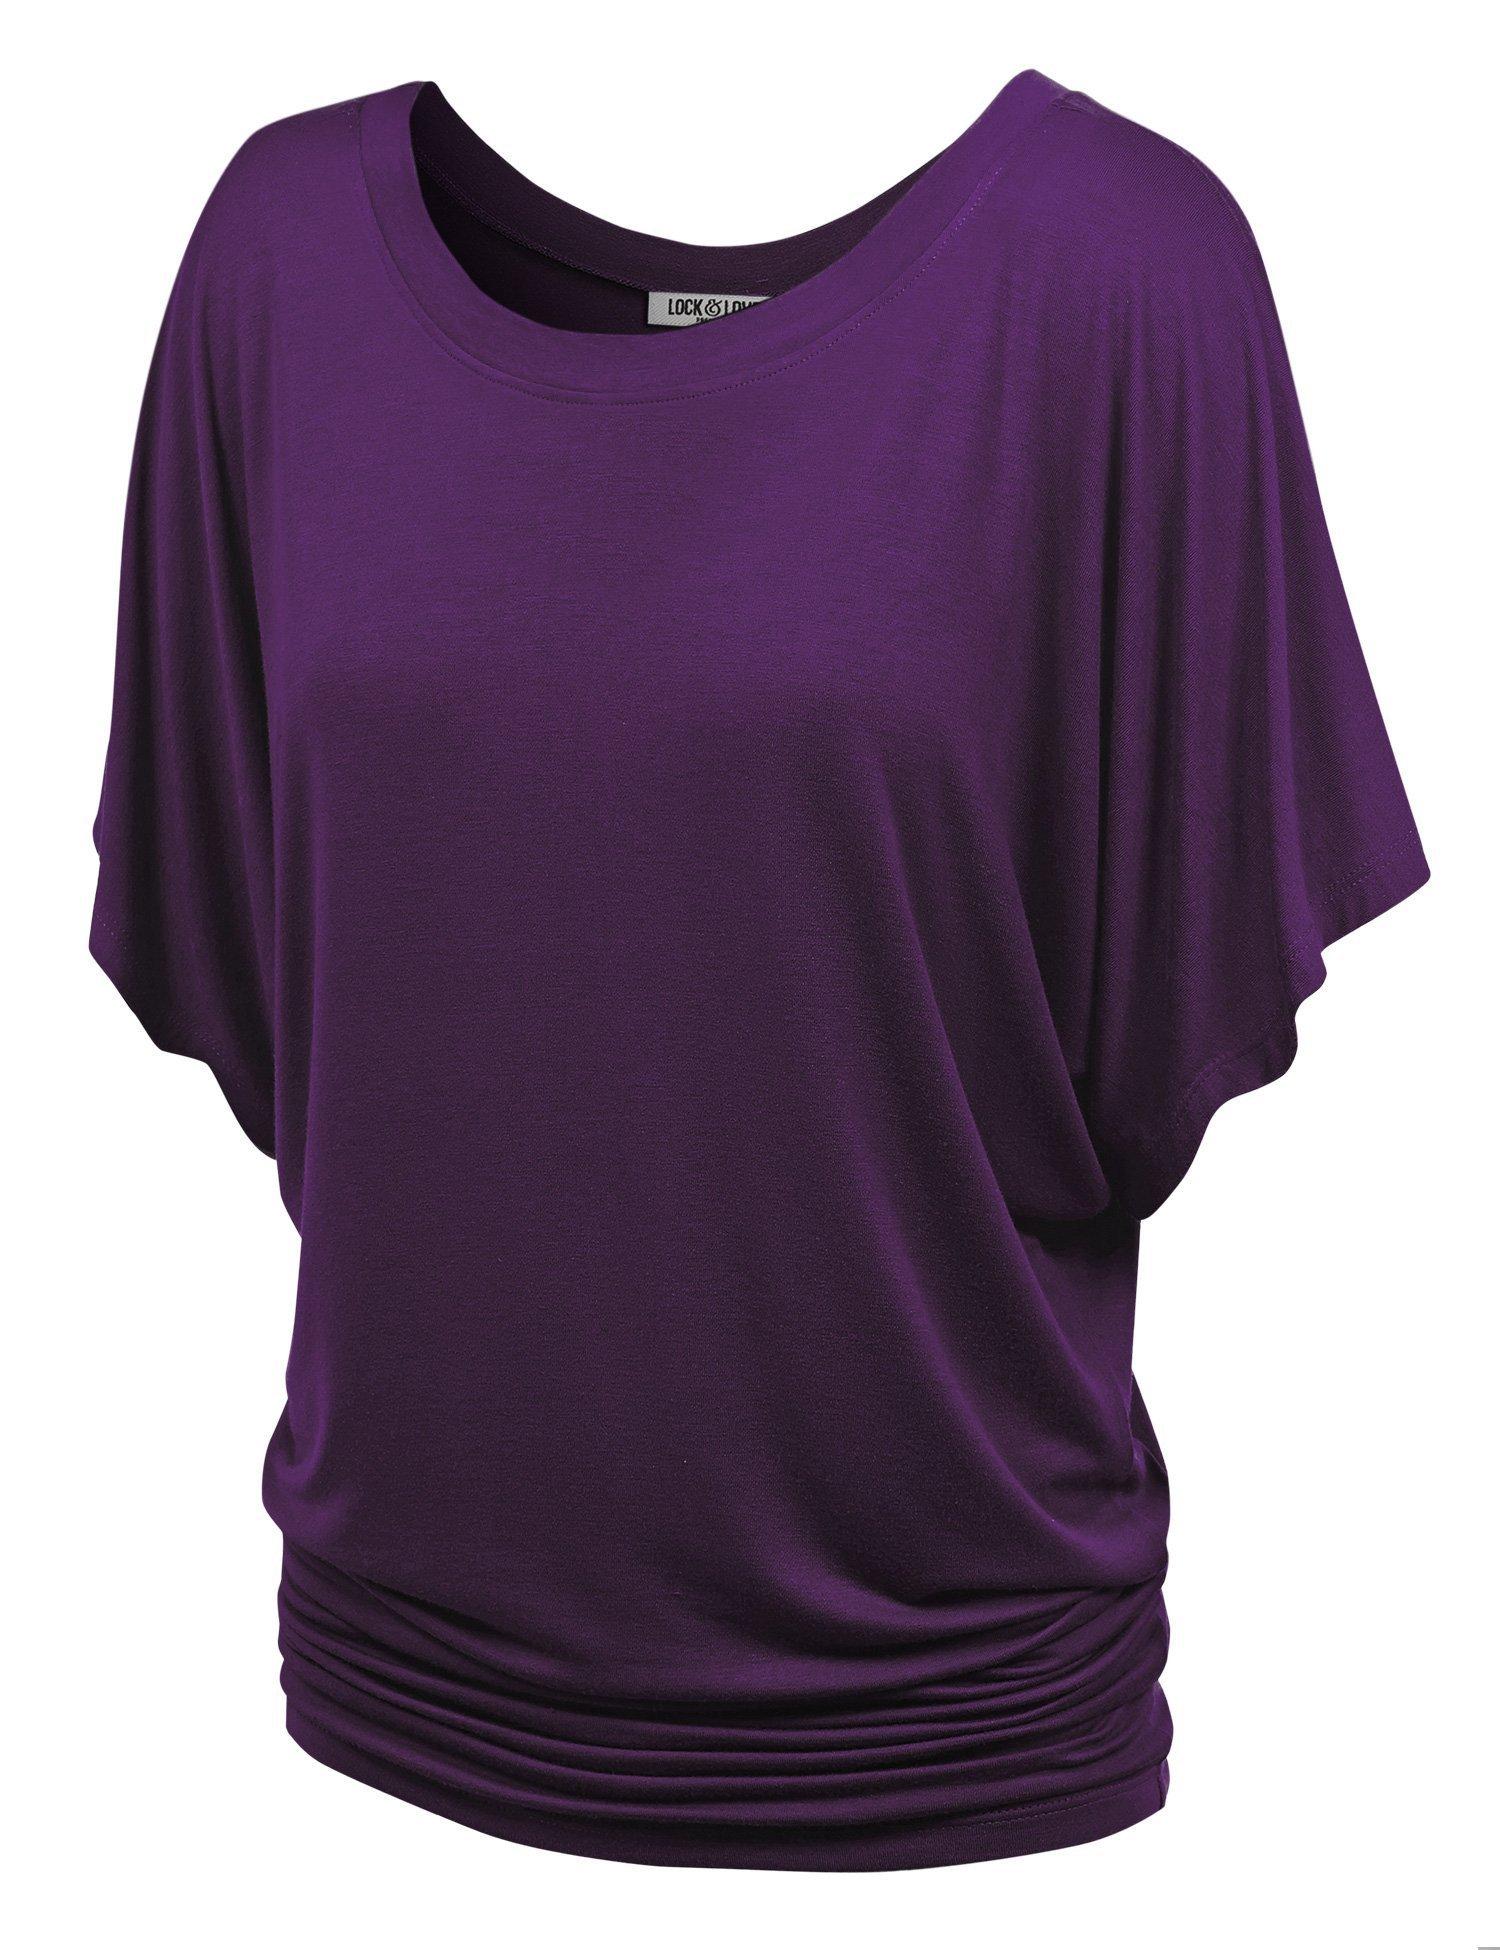 WT742 Womens Boat Neck Short Sleeve Dolman Drape Top XL Dark_Purple